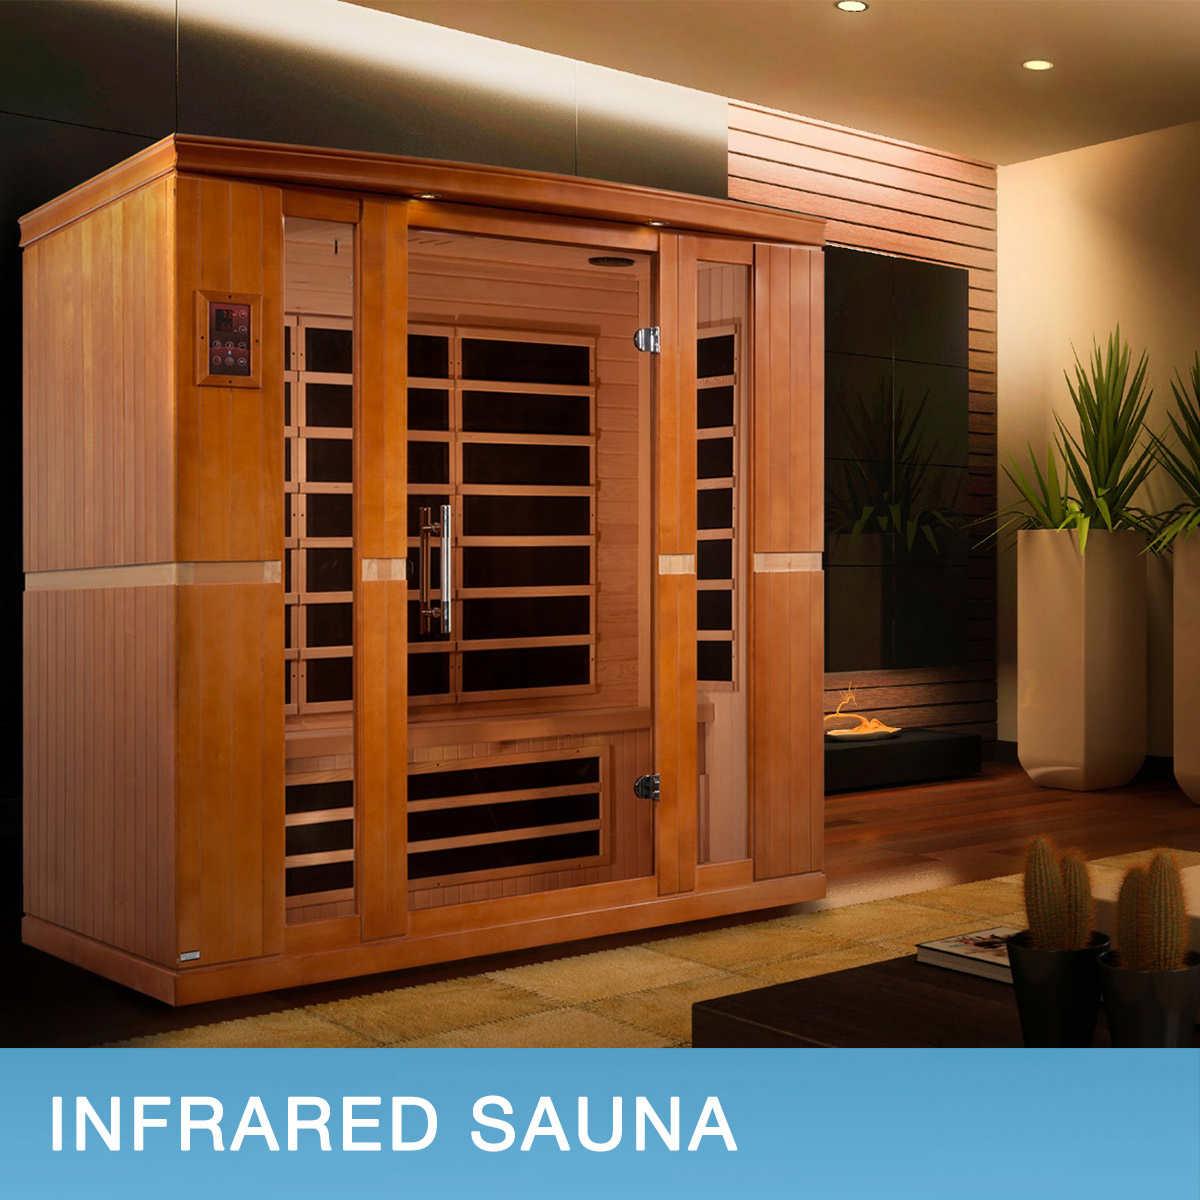 Dynamic Bergamo 4-person Indoor Low EMF FAR Infrared Sauna